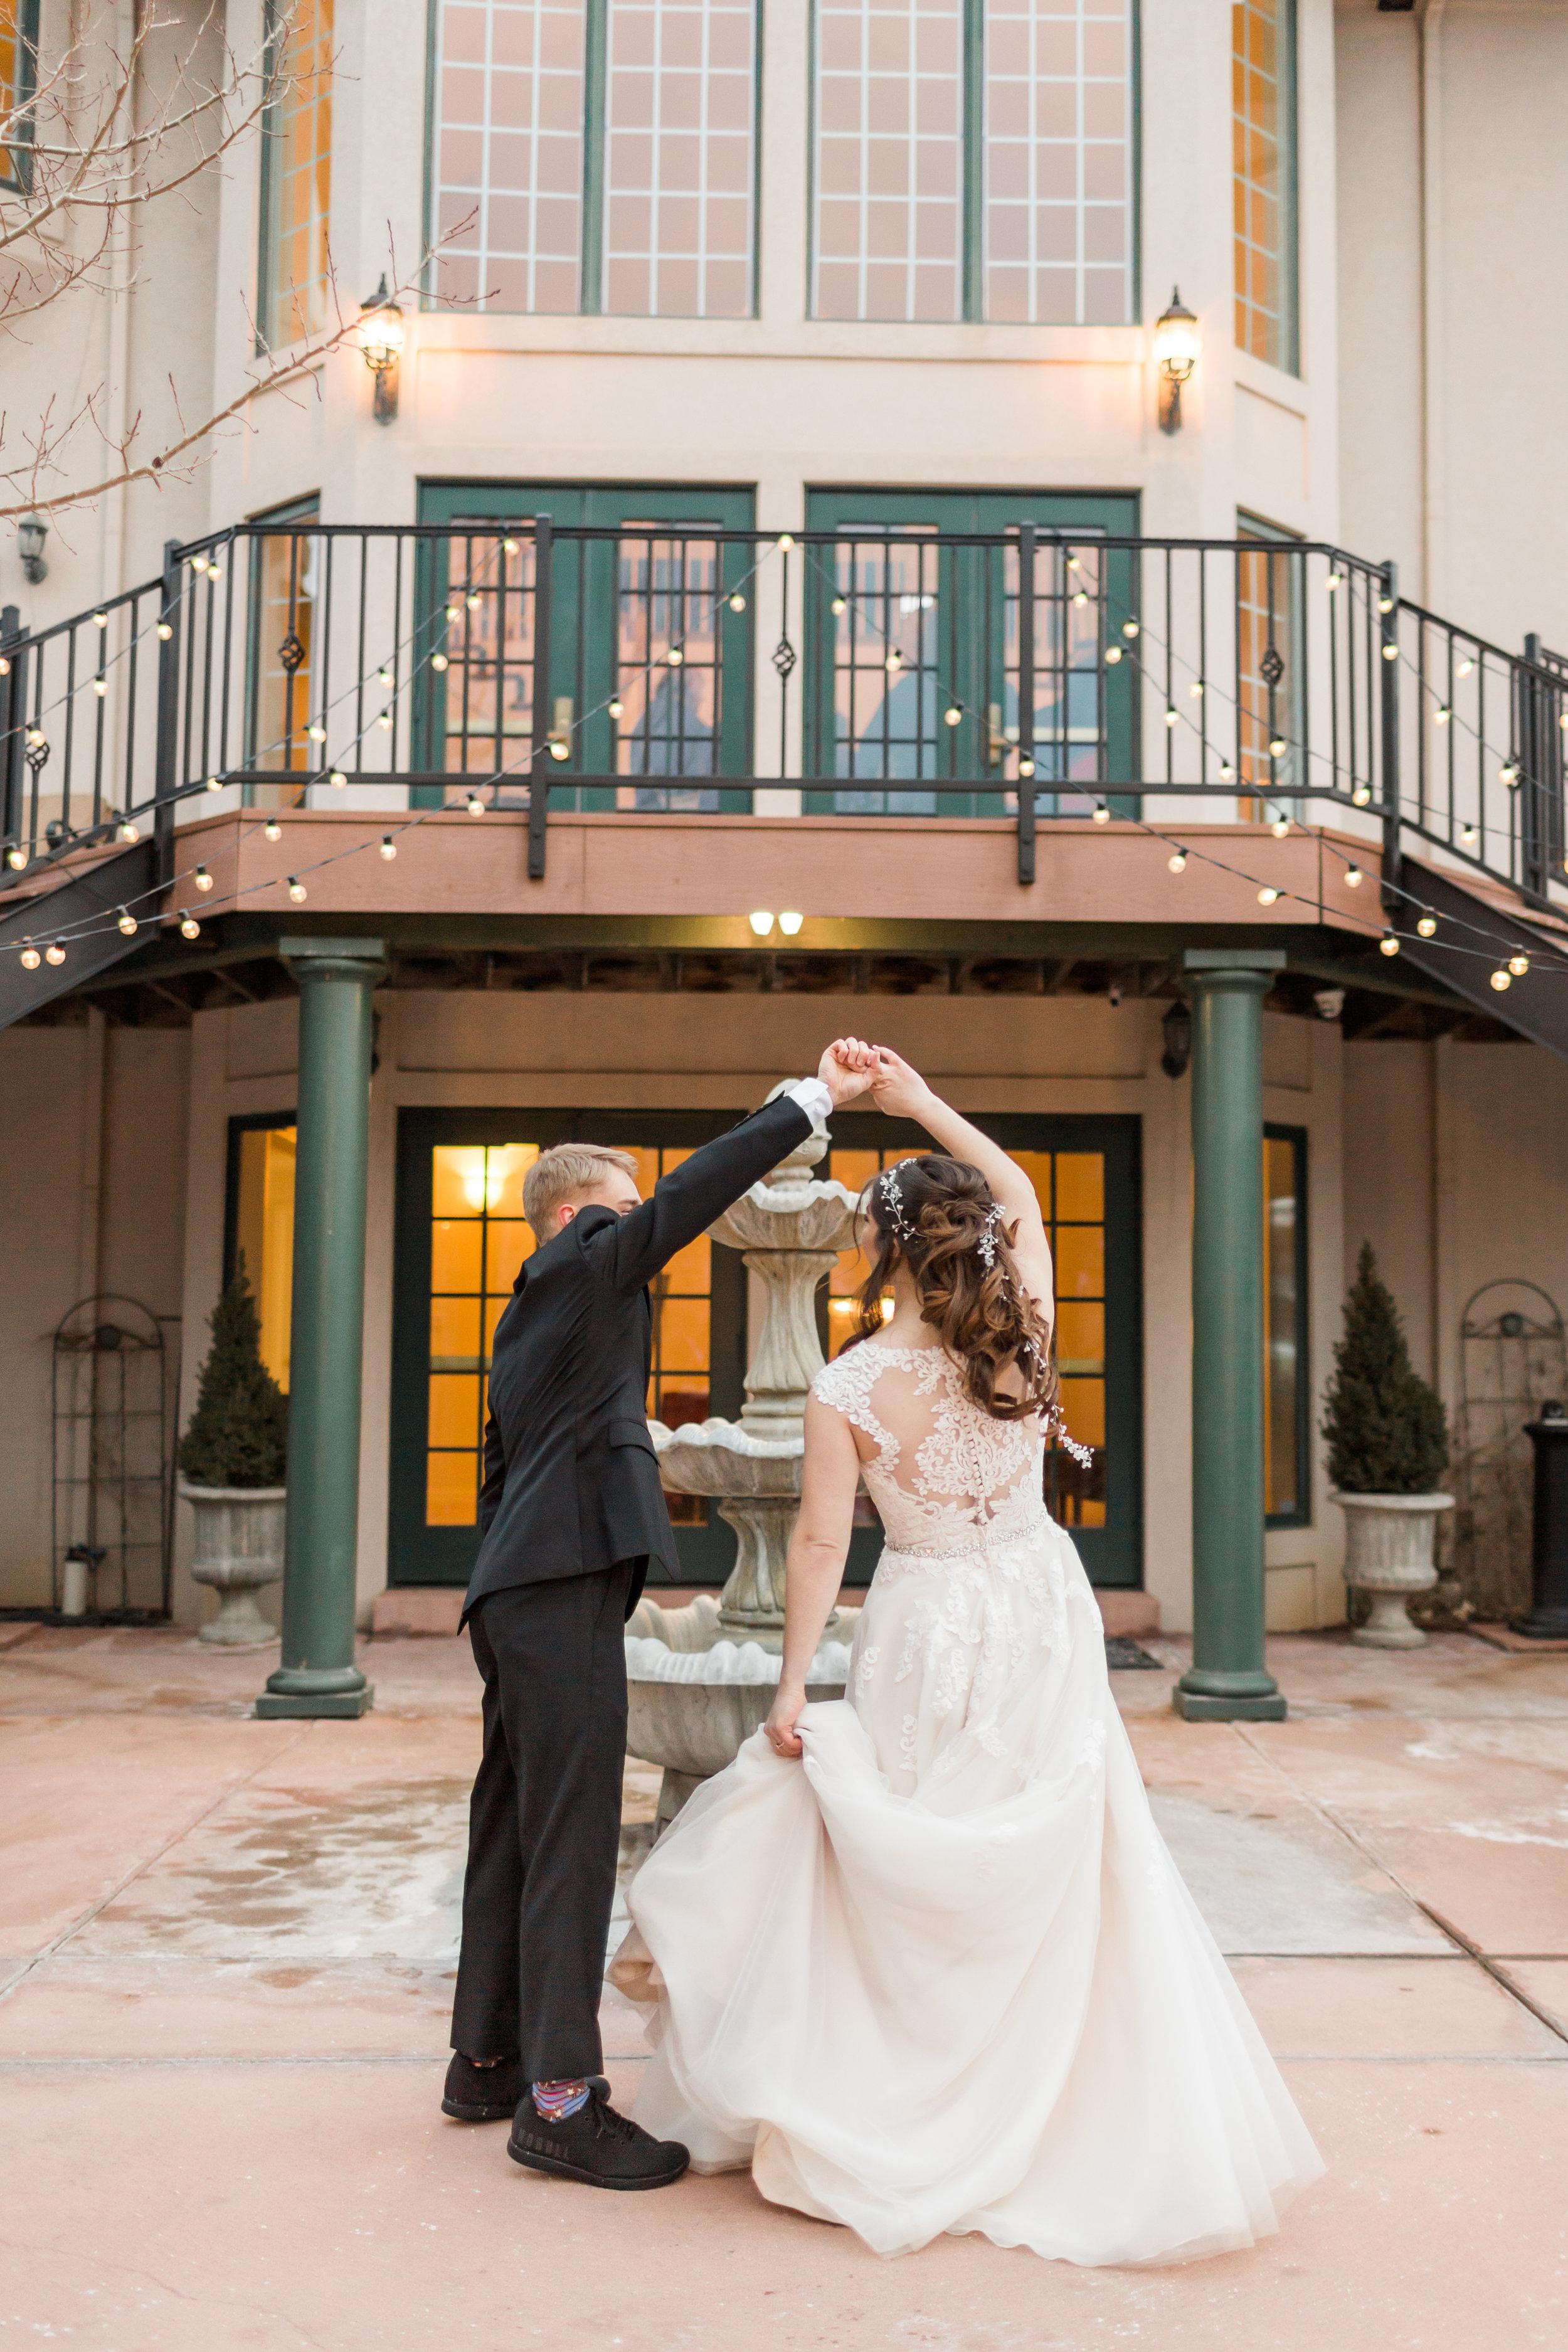 romanticcoloradodestinationwedding-47.jpg